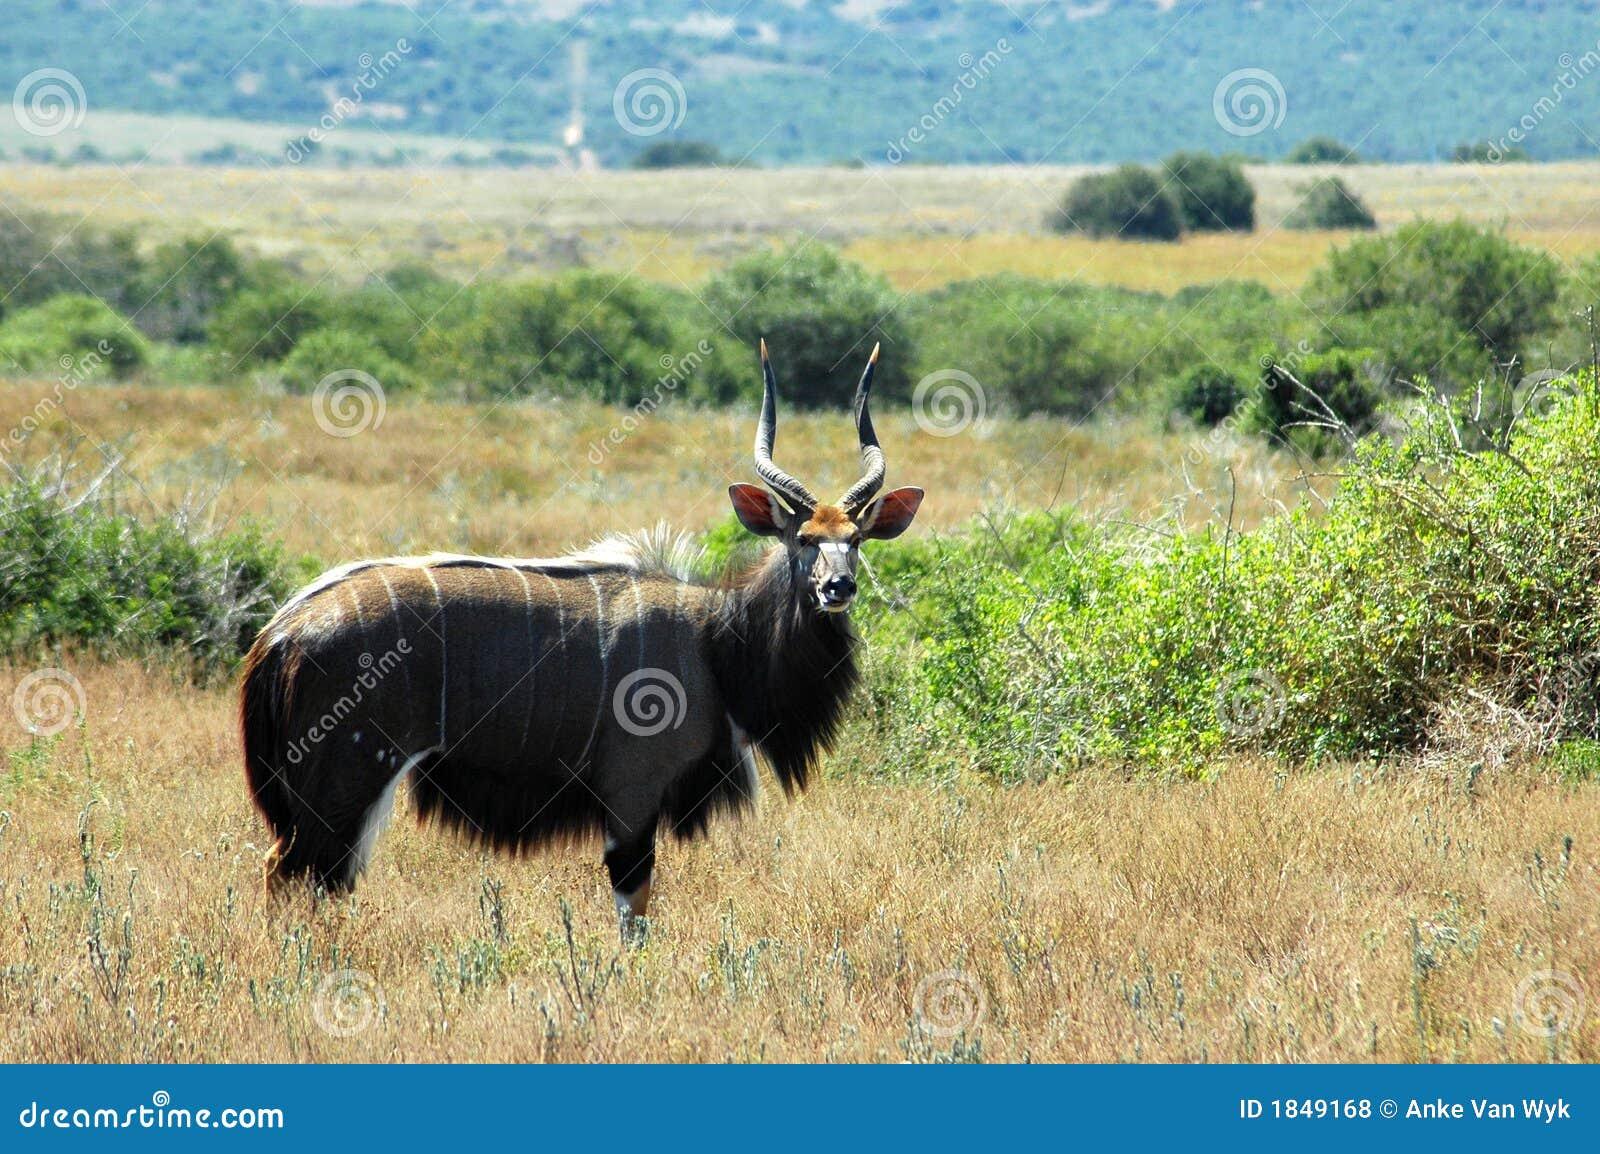 Afrikas wild lebende Tiere